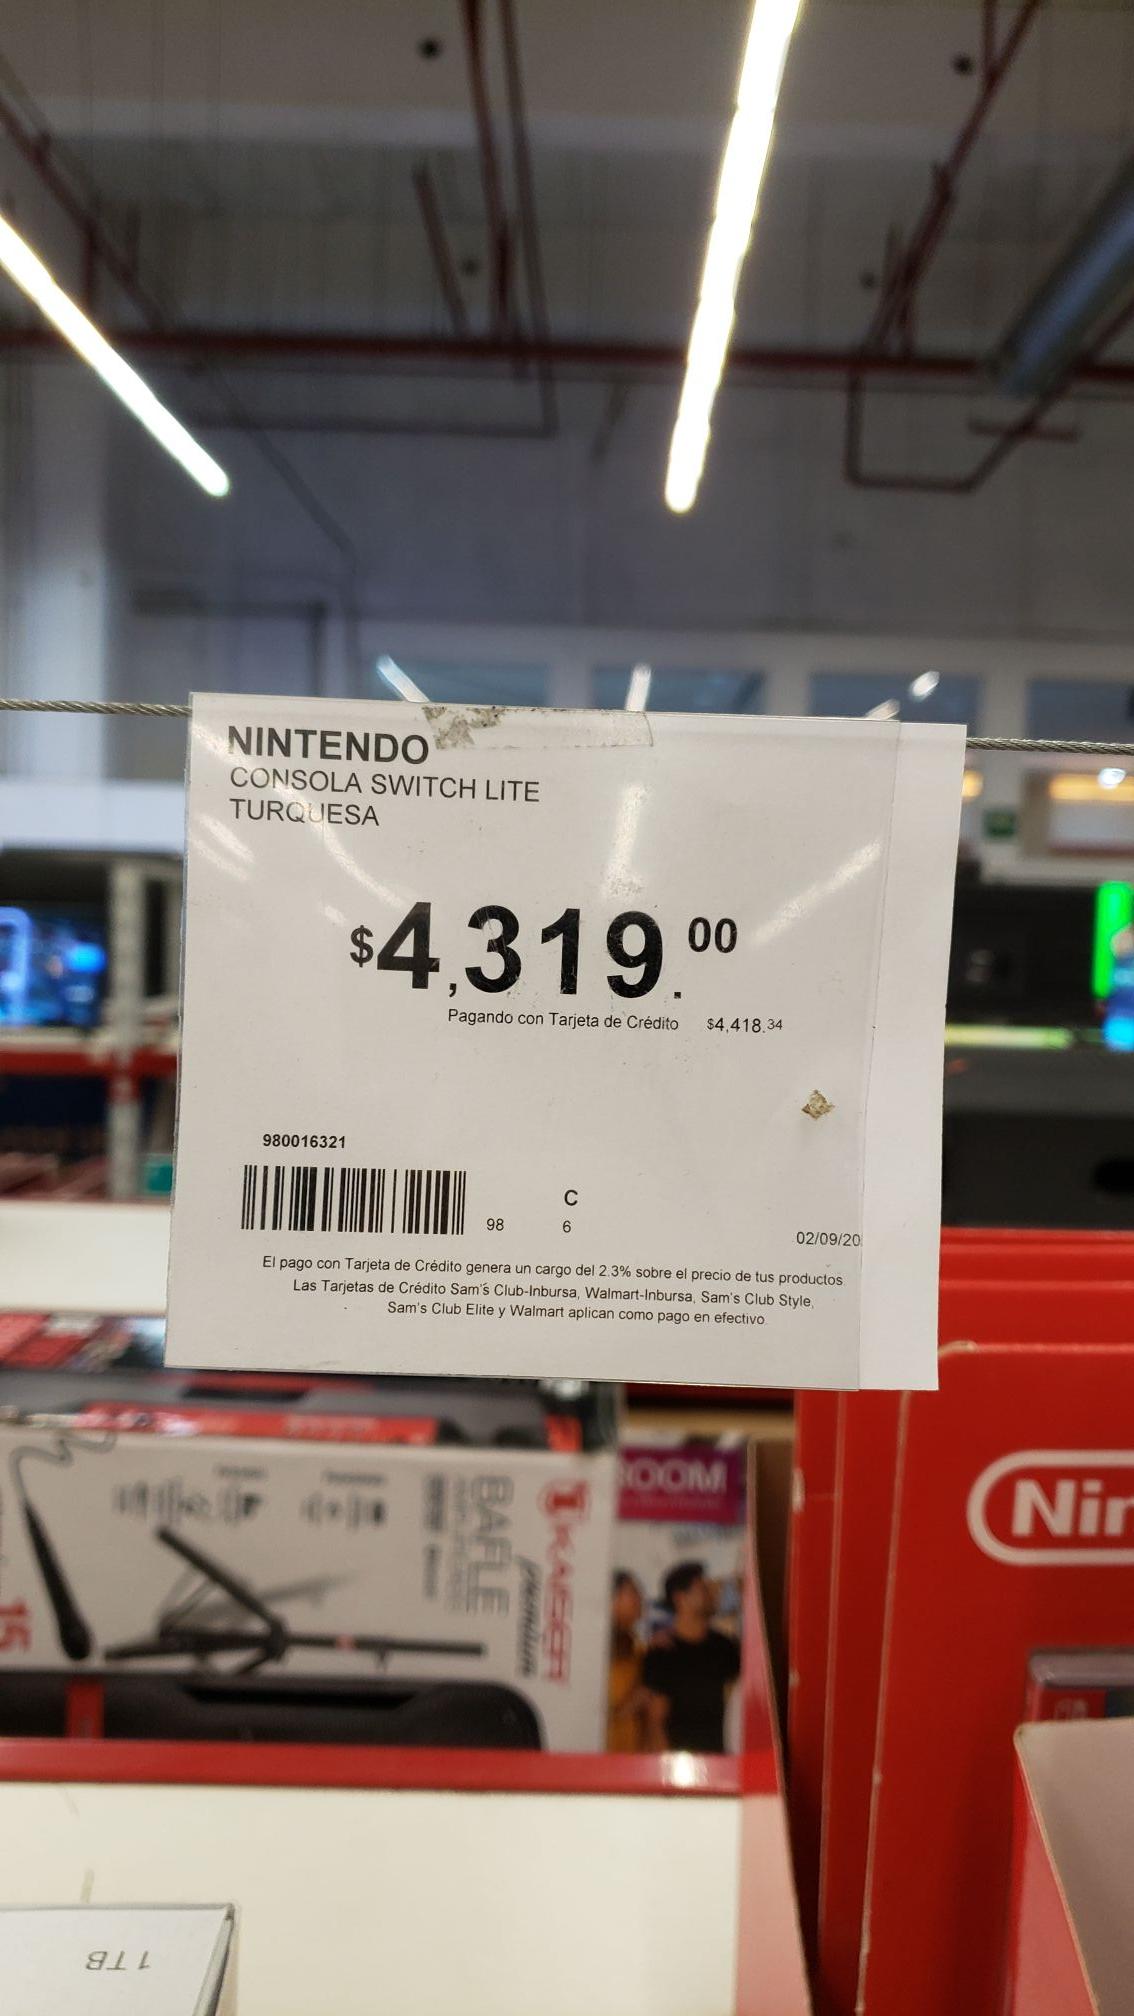 Sam's Club: Nintendo switch lite